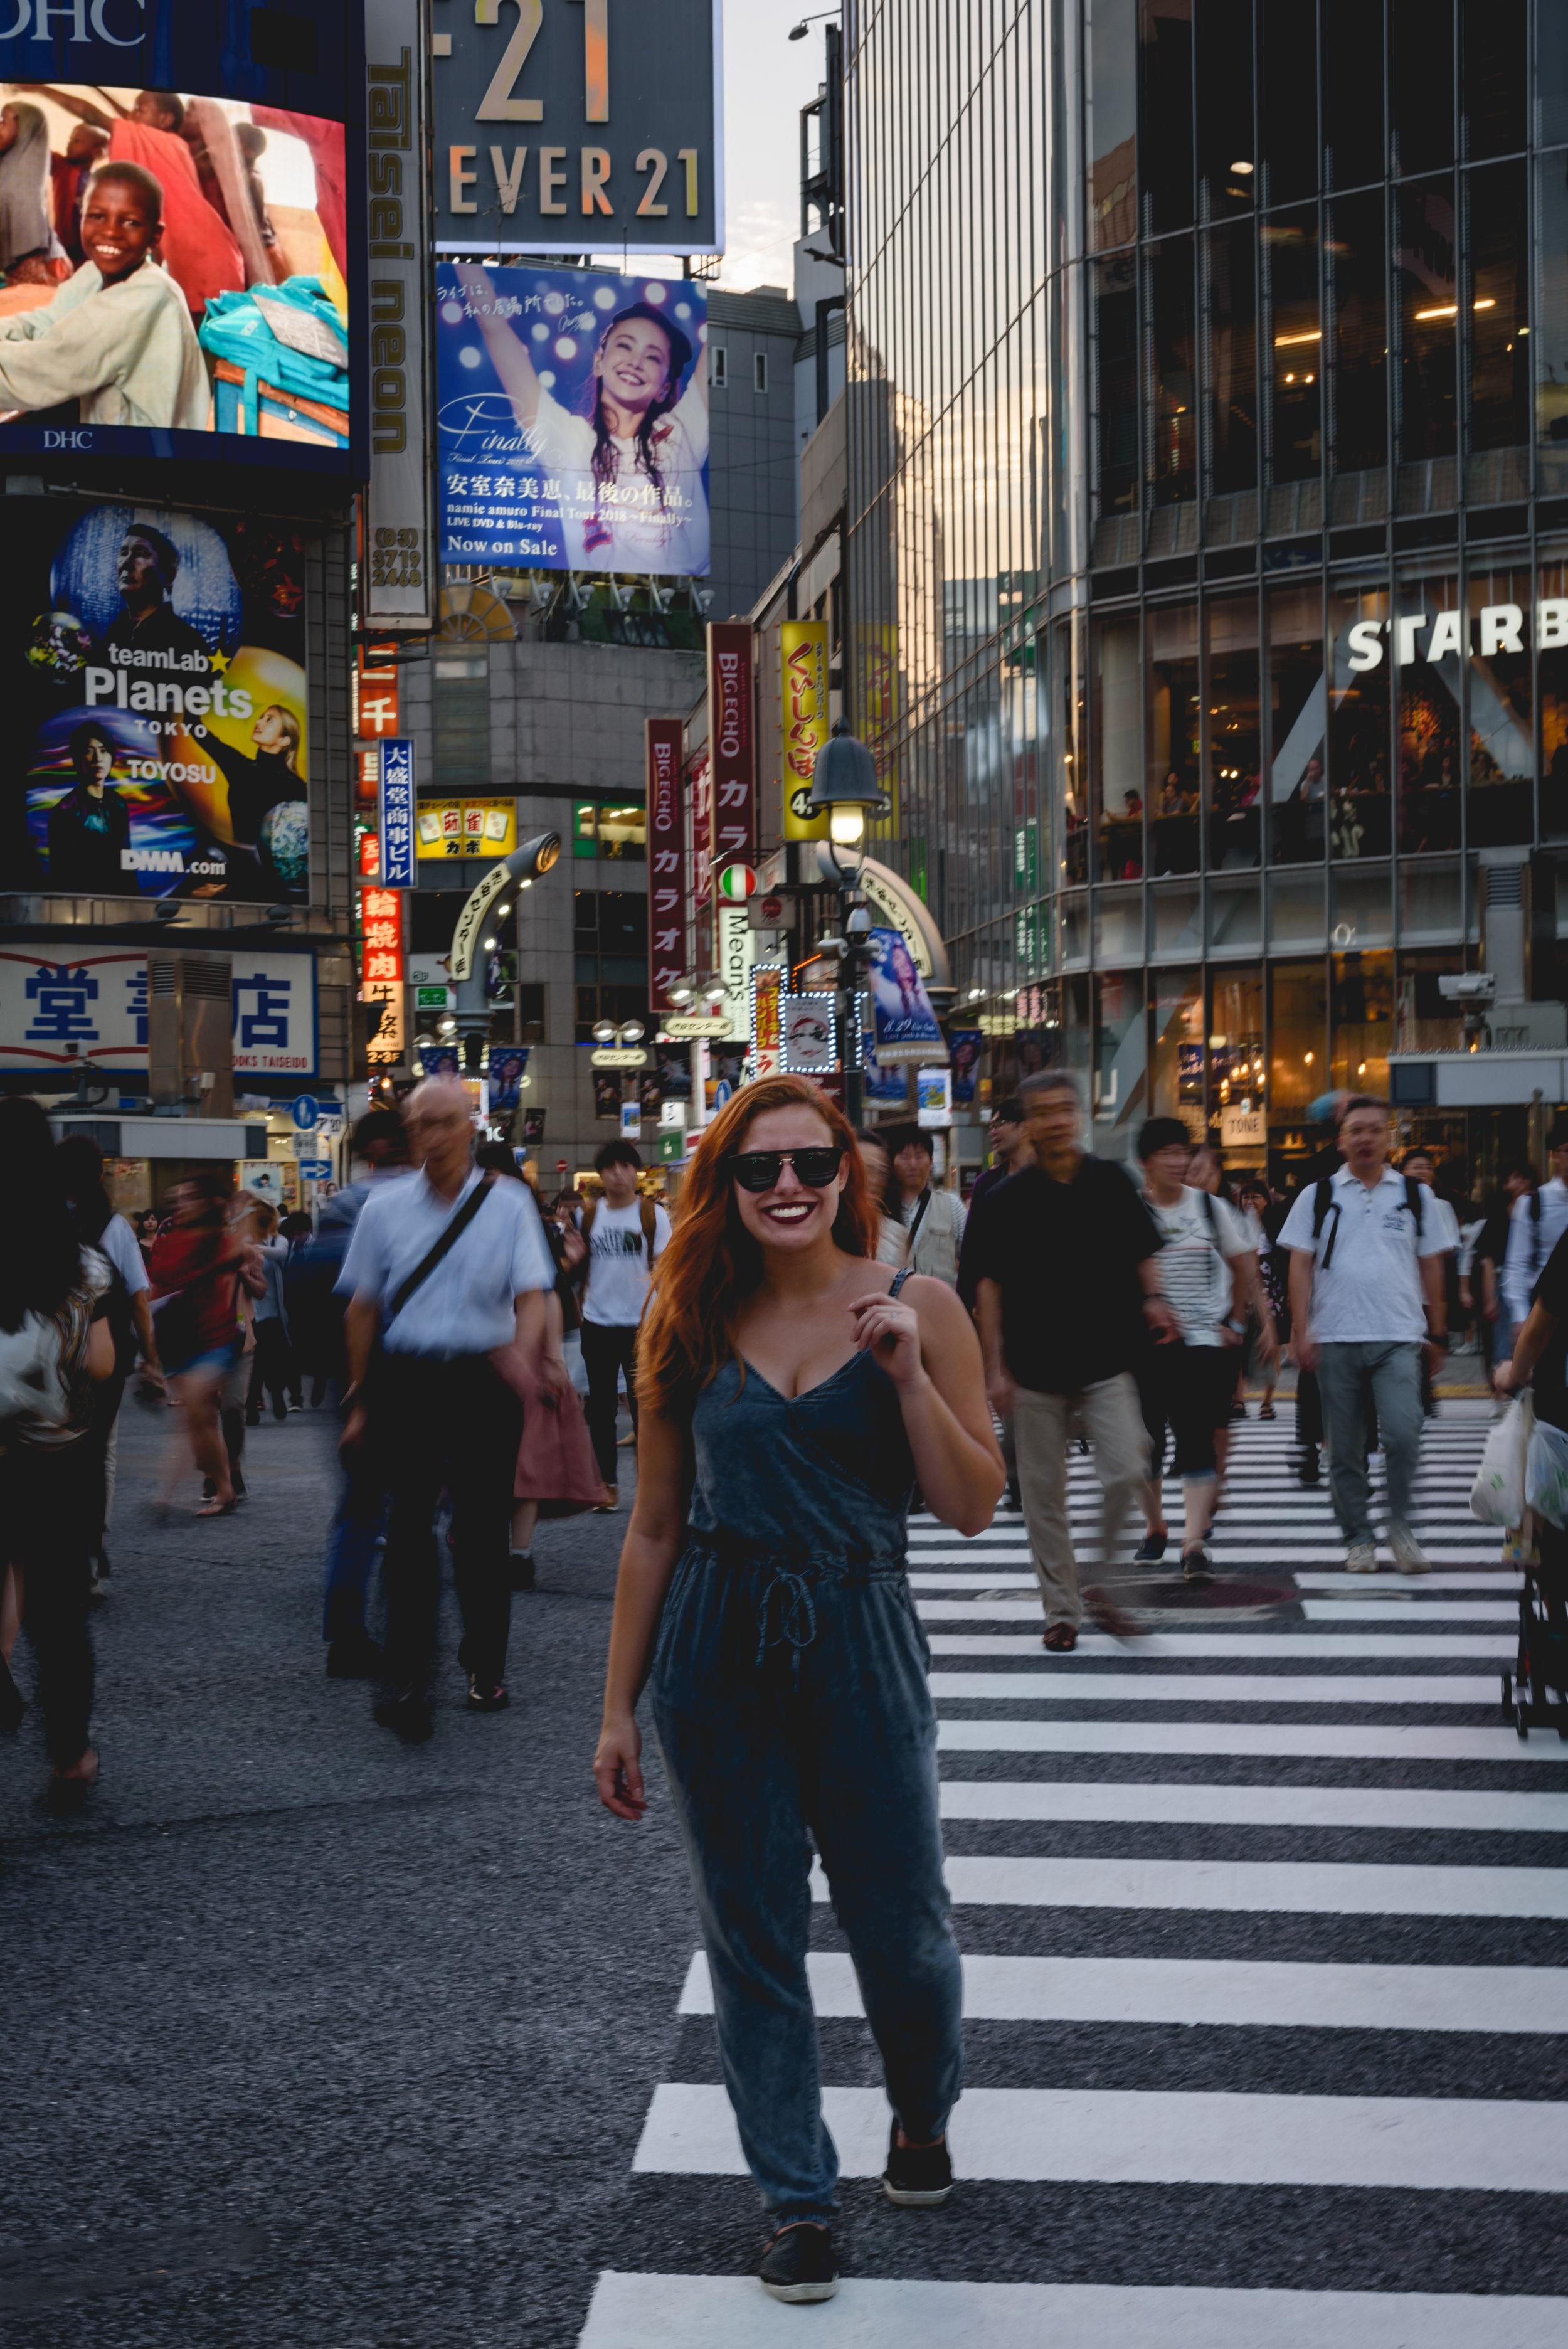 2018-09-05 Fotos na Mala Tokyo - Thais & Estevam -7.jpg